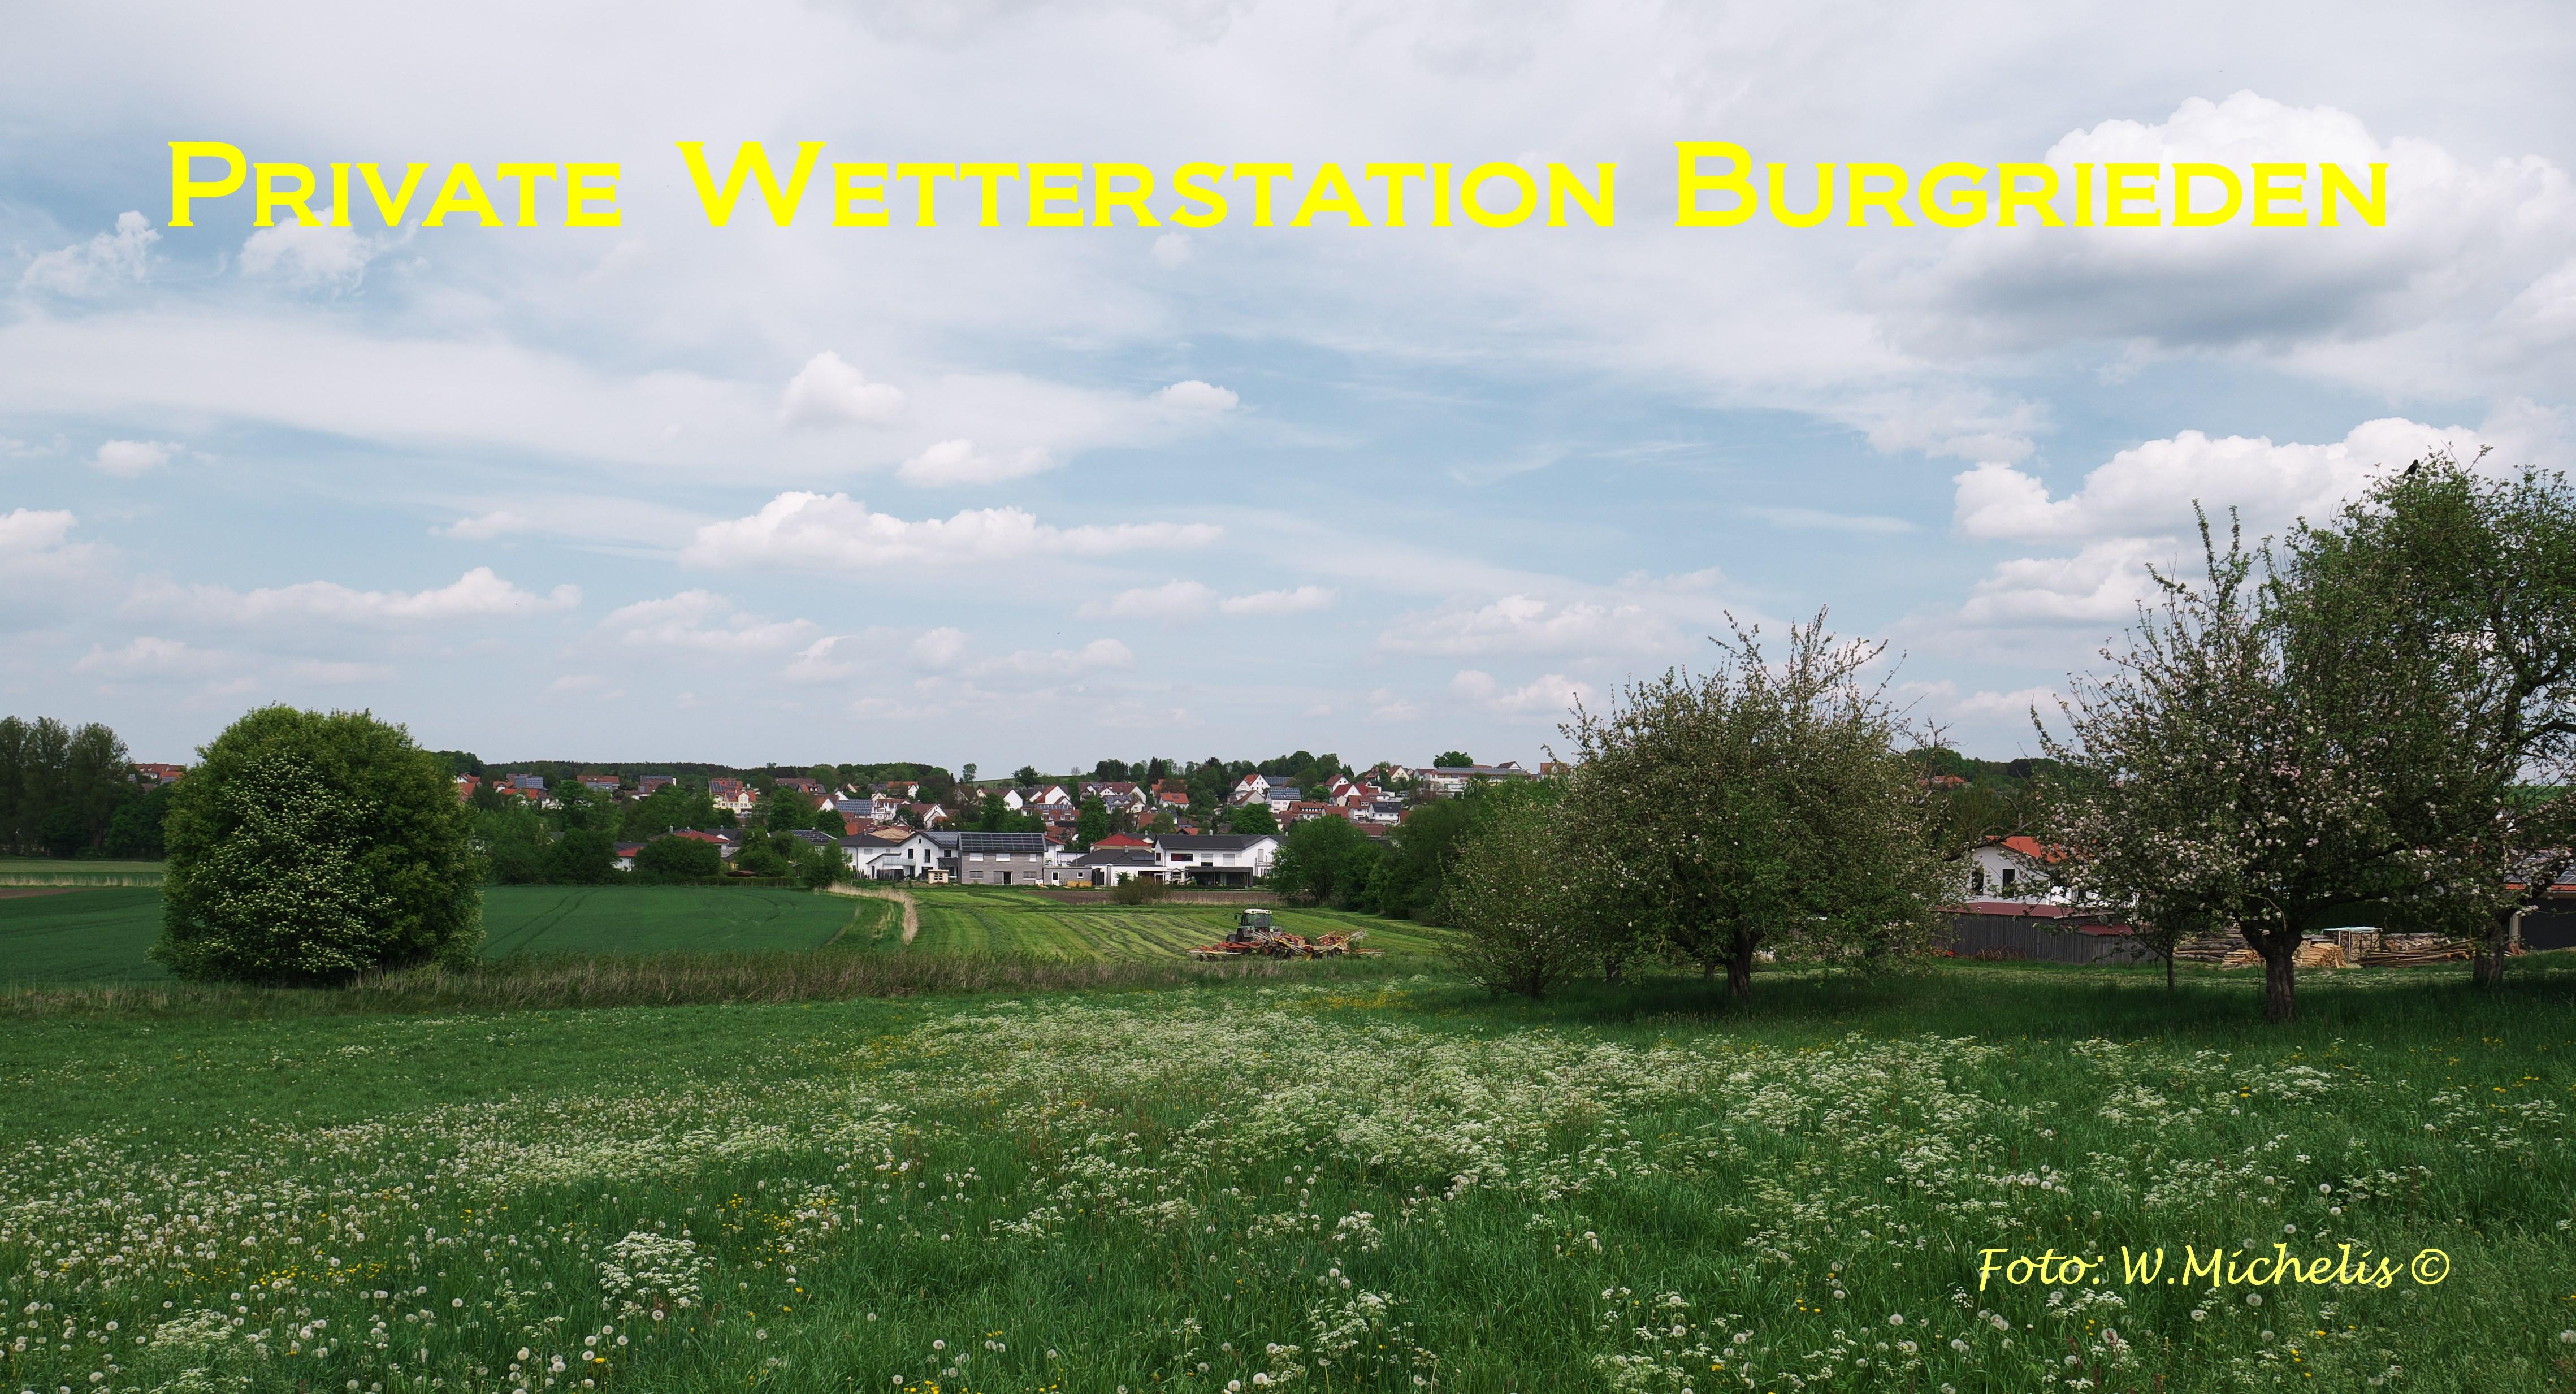 Wetter Burgrieden